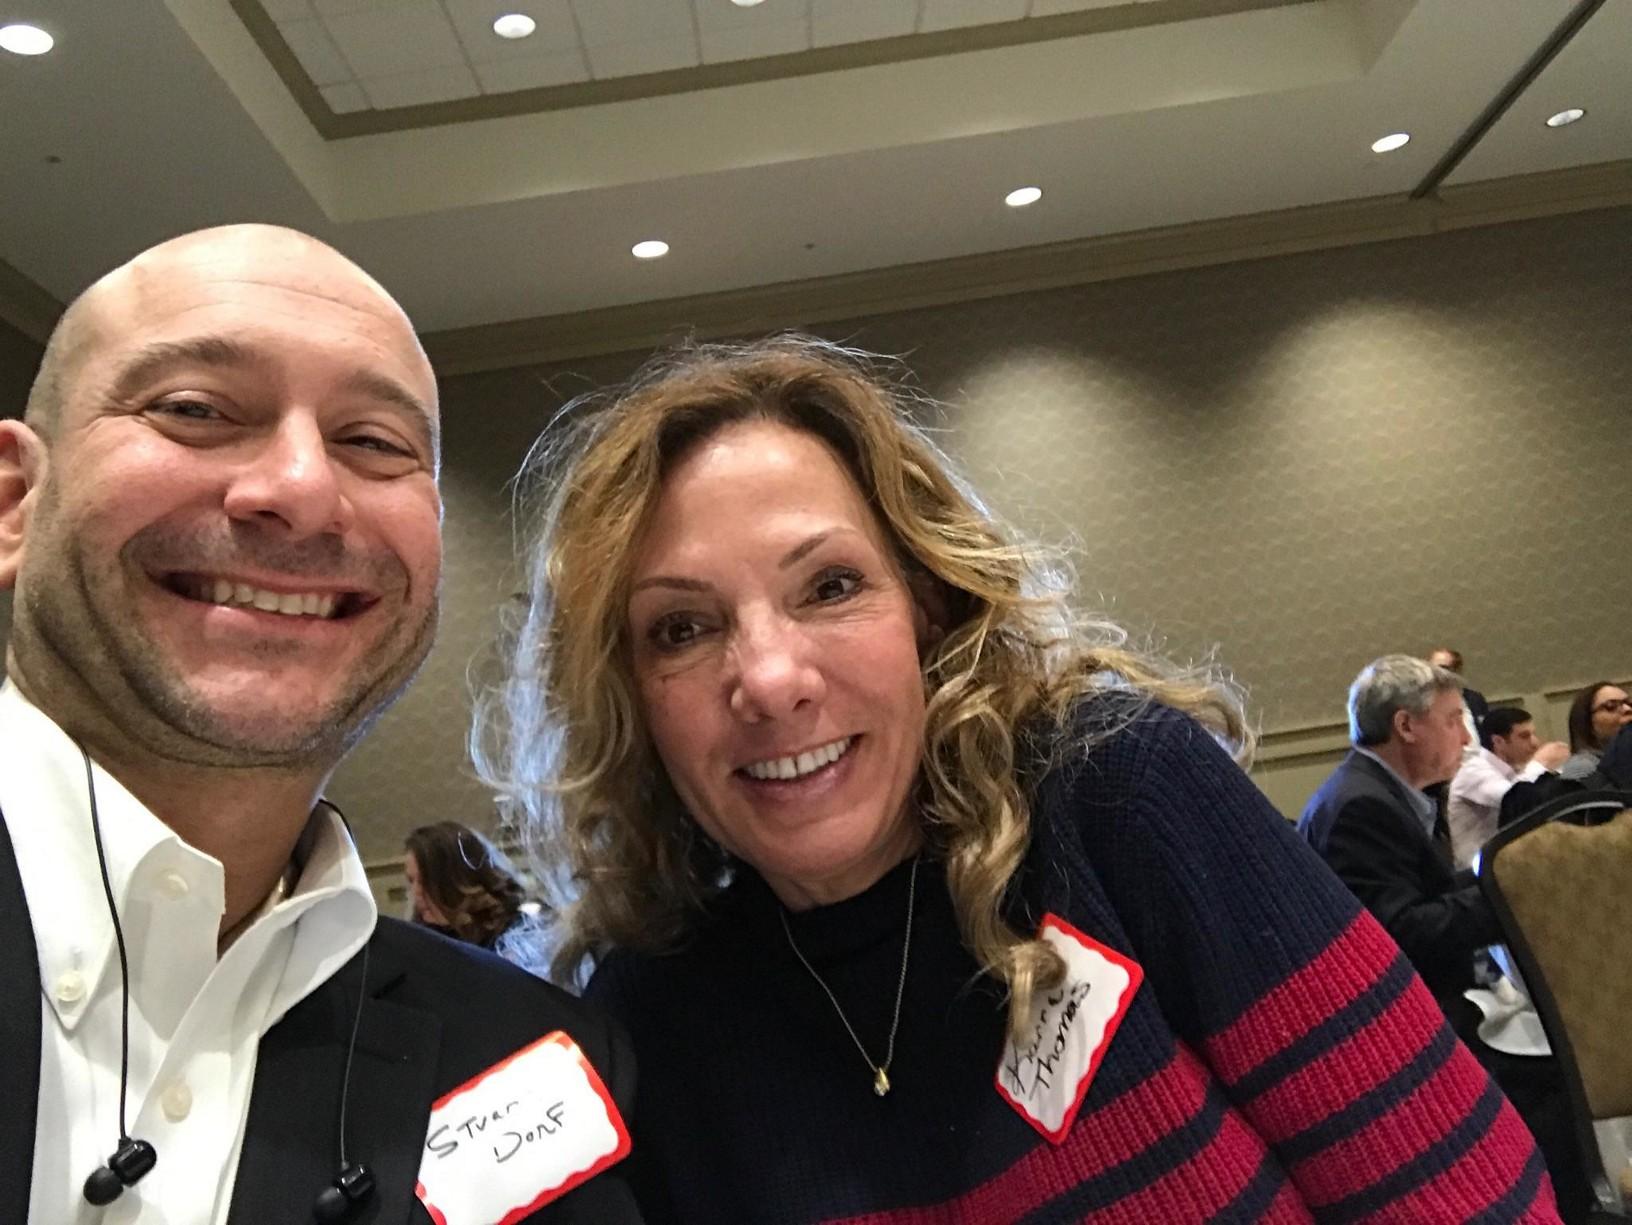 Stuart Dorf and Karrie Thomas